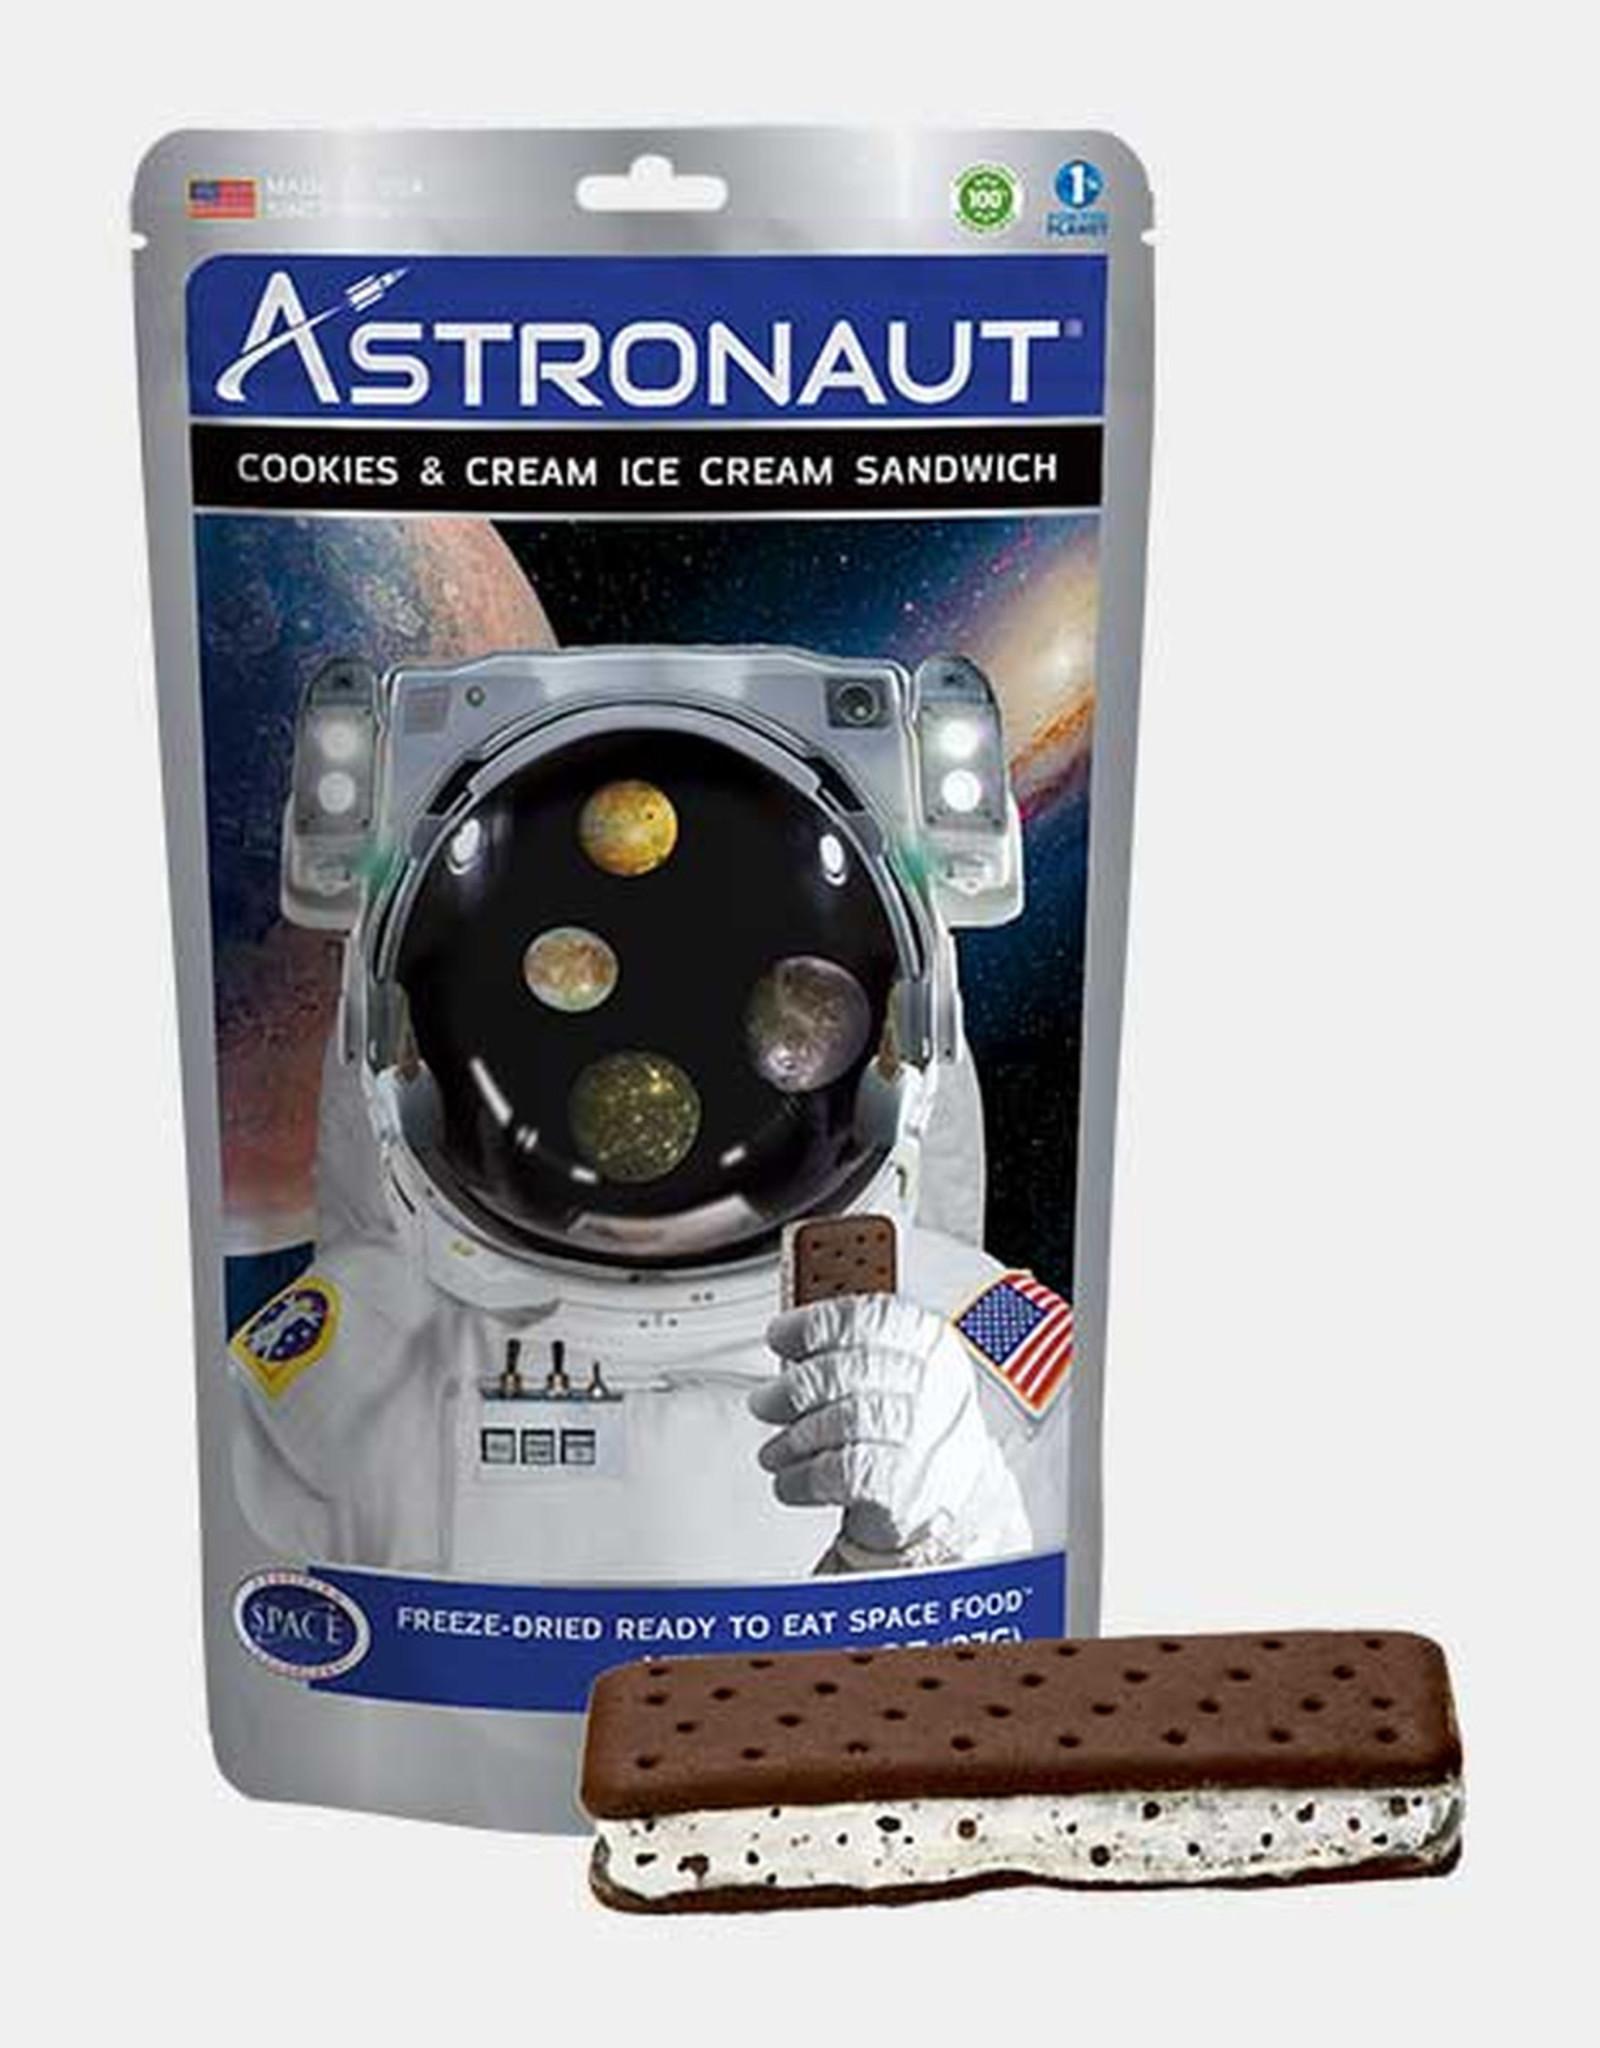 Astronaut Ice Cream - Cookies & Cream Sandwich